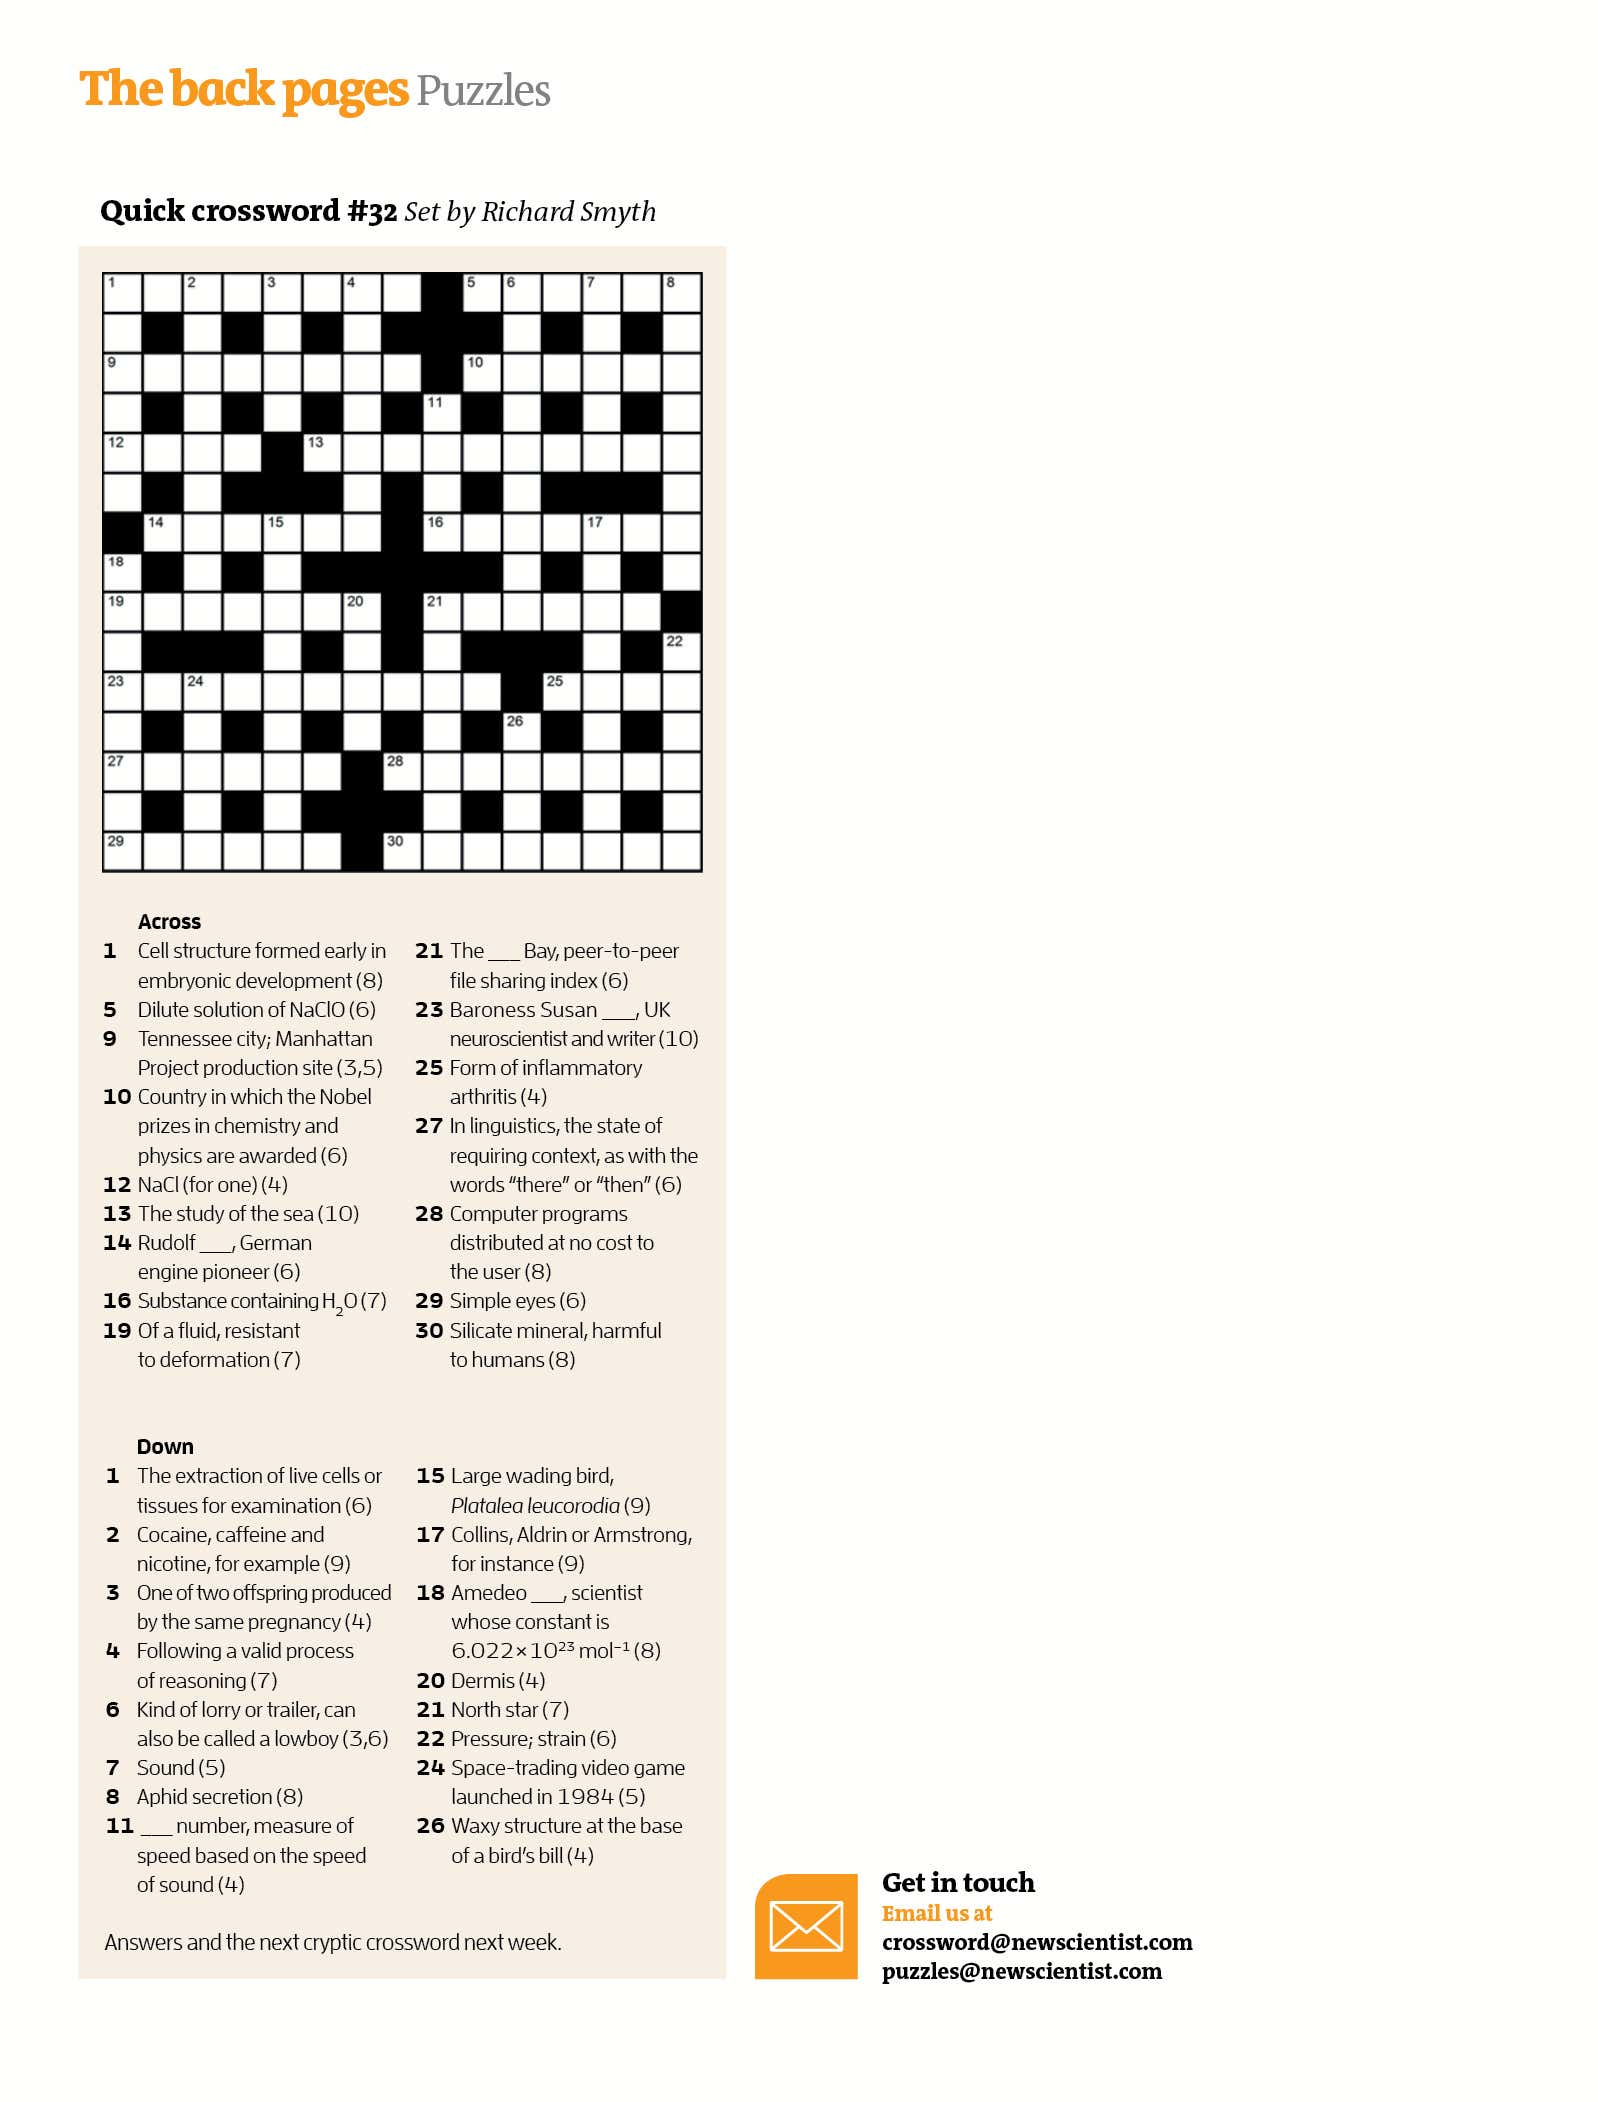 Quick Crossword #32   New Scientist - Printable Quick Crossword Puzzles